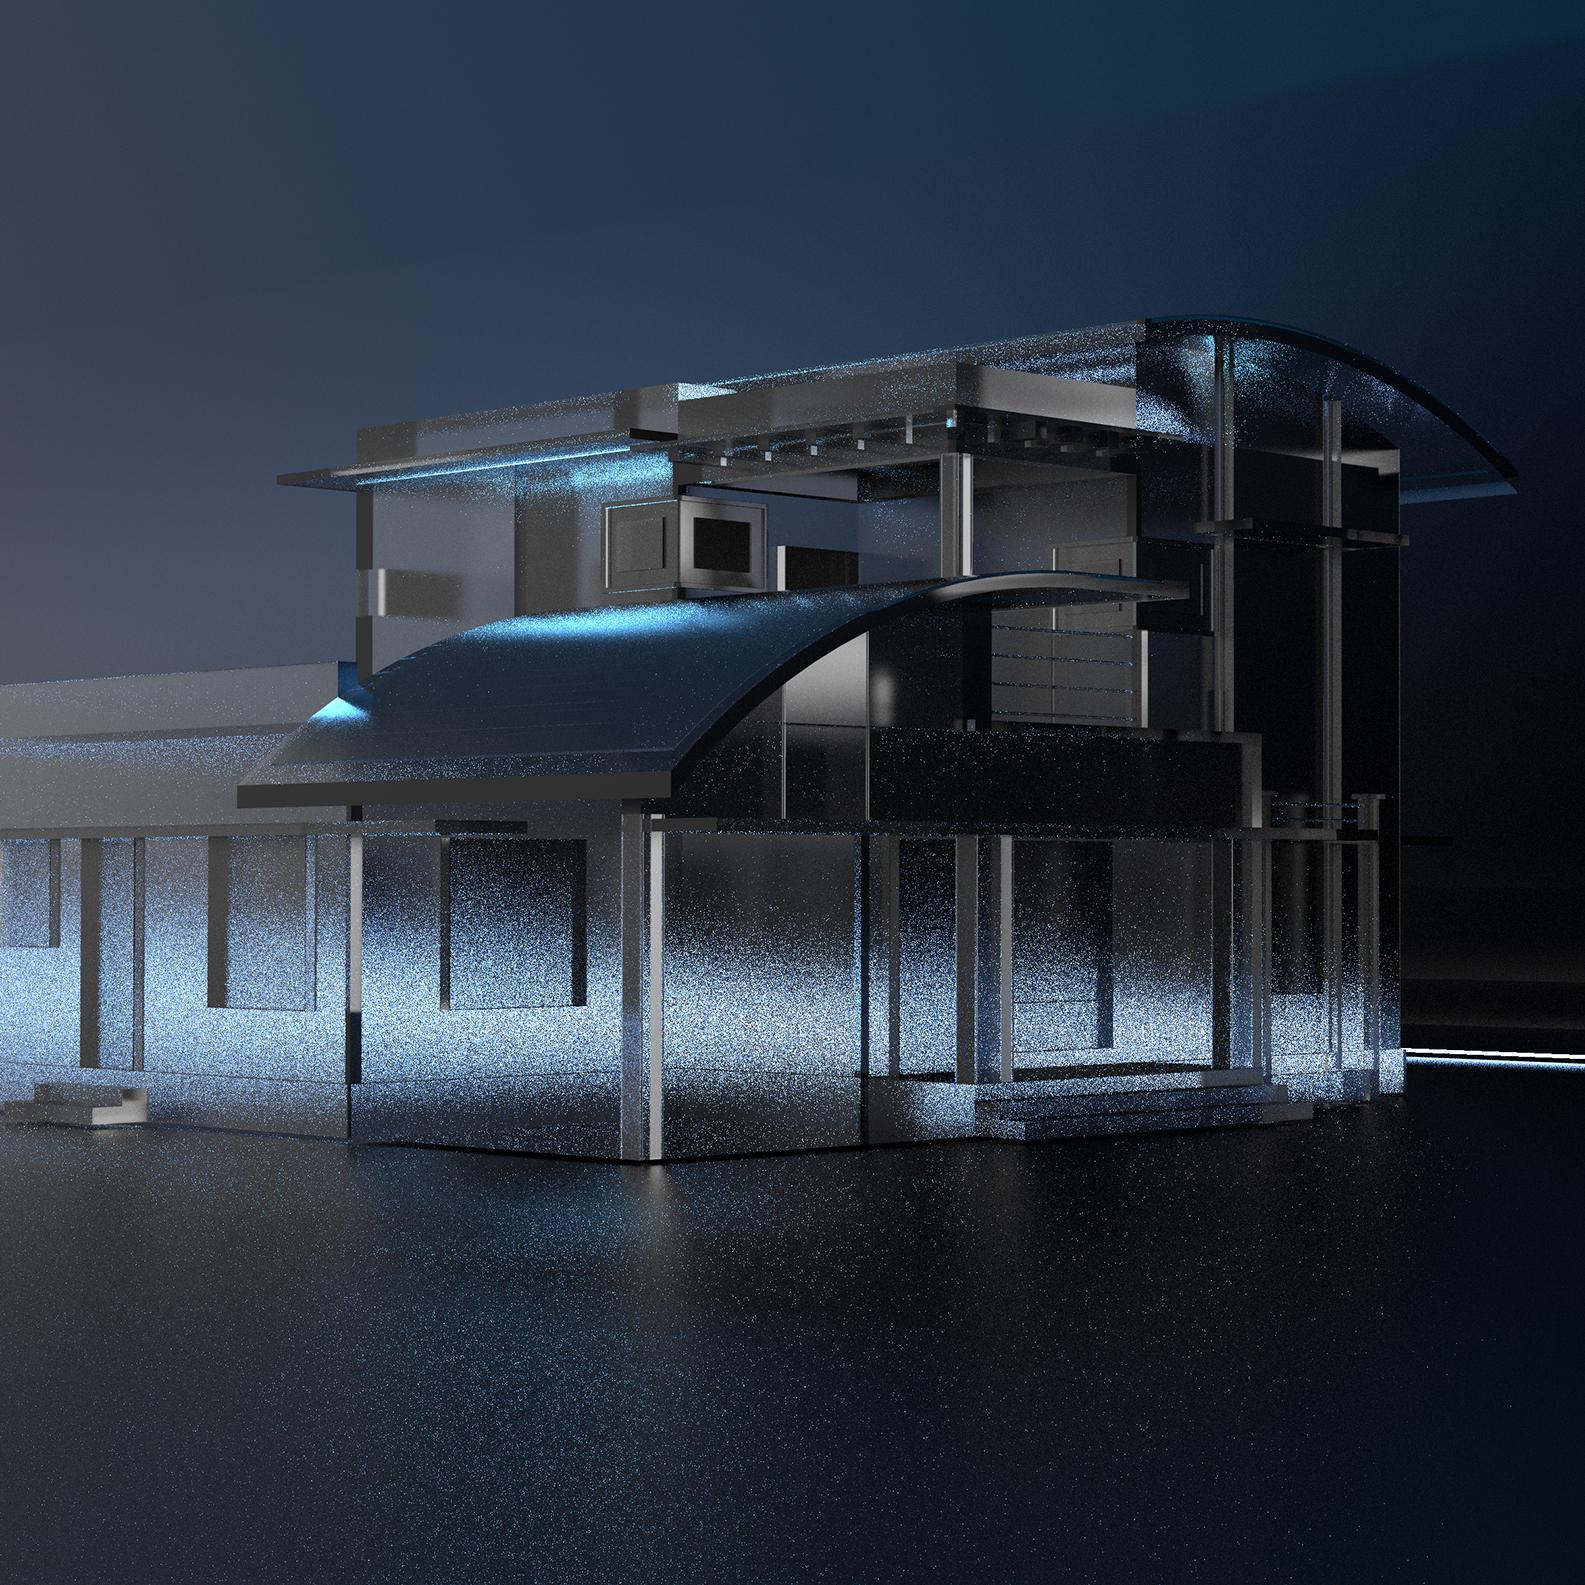 الريفيت المعماري | Revit Architecture